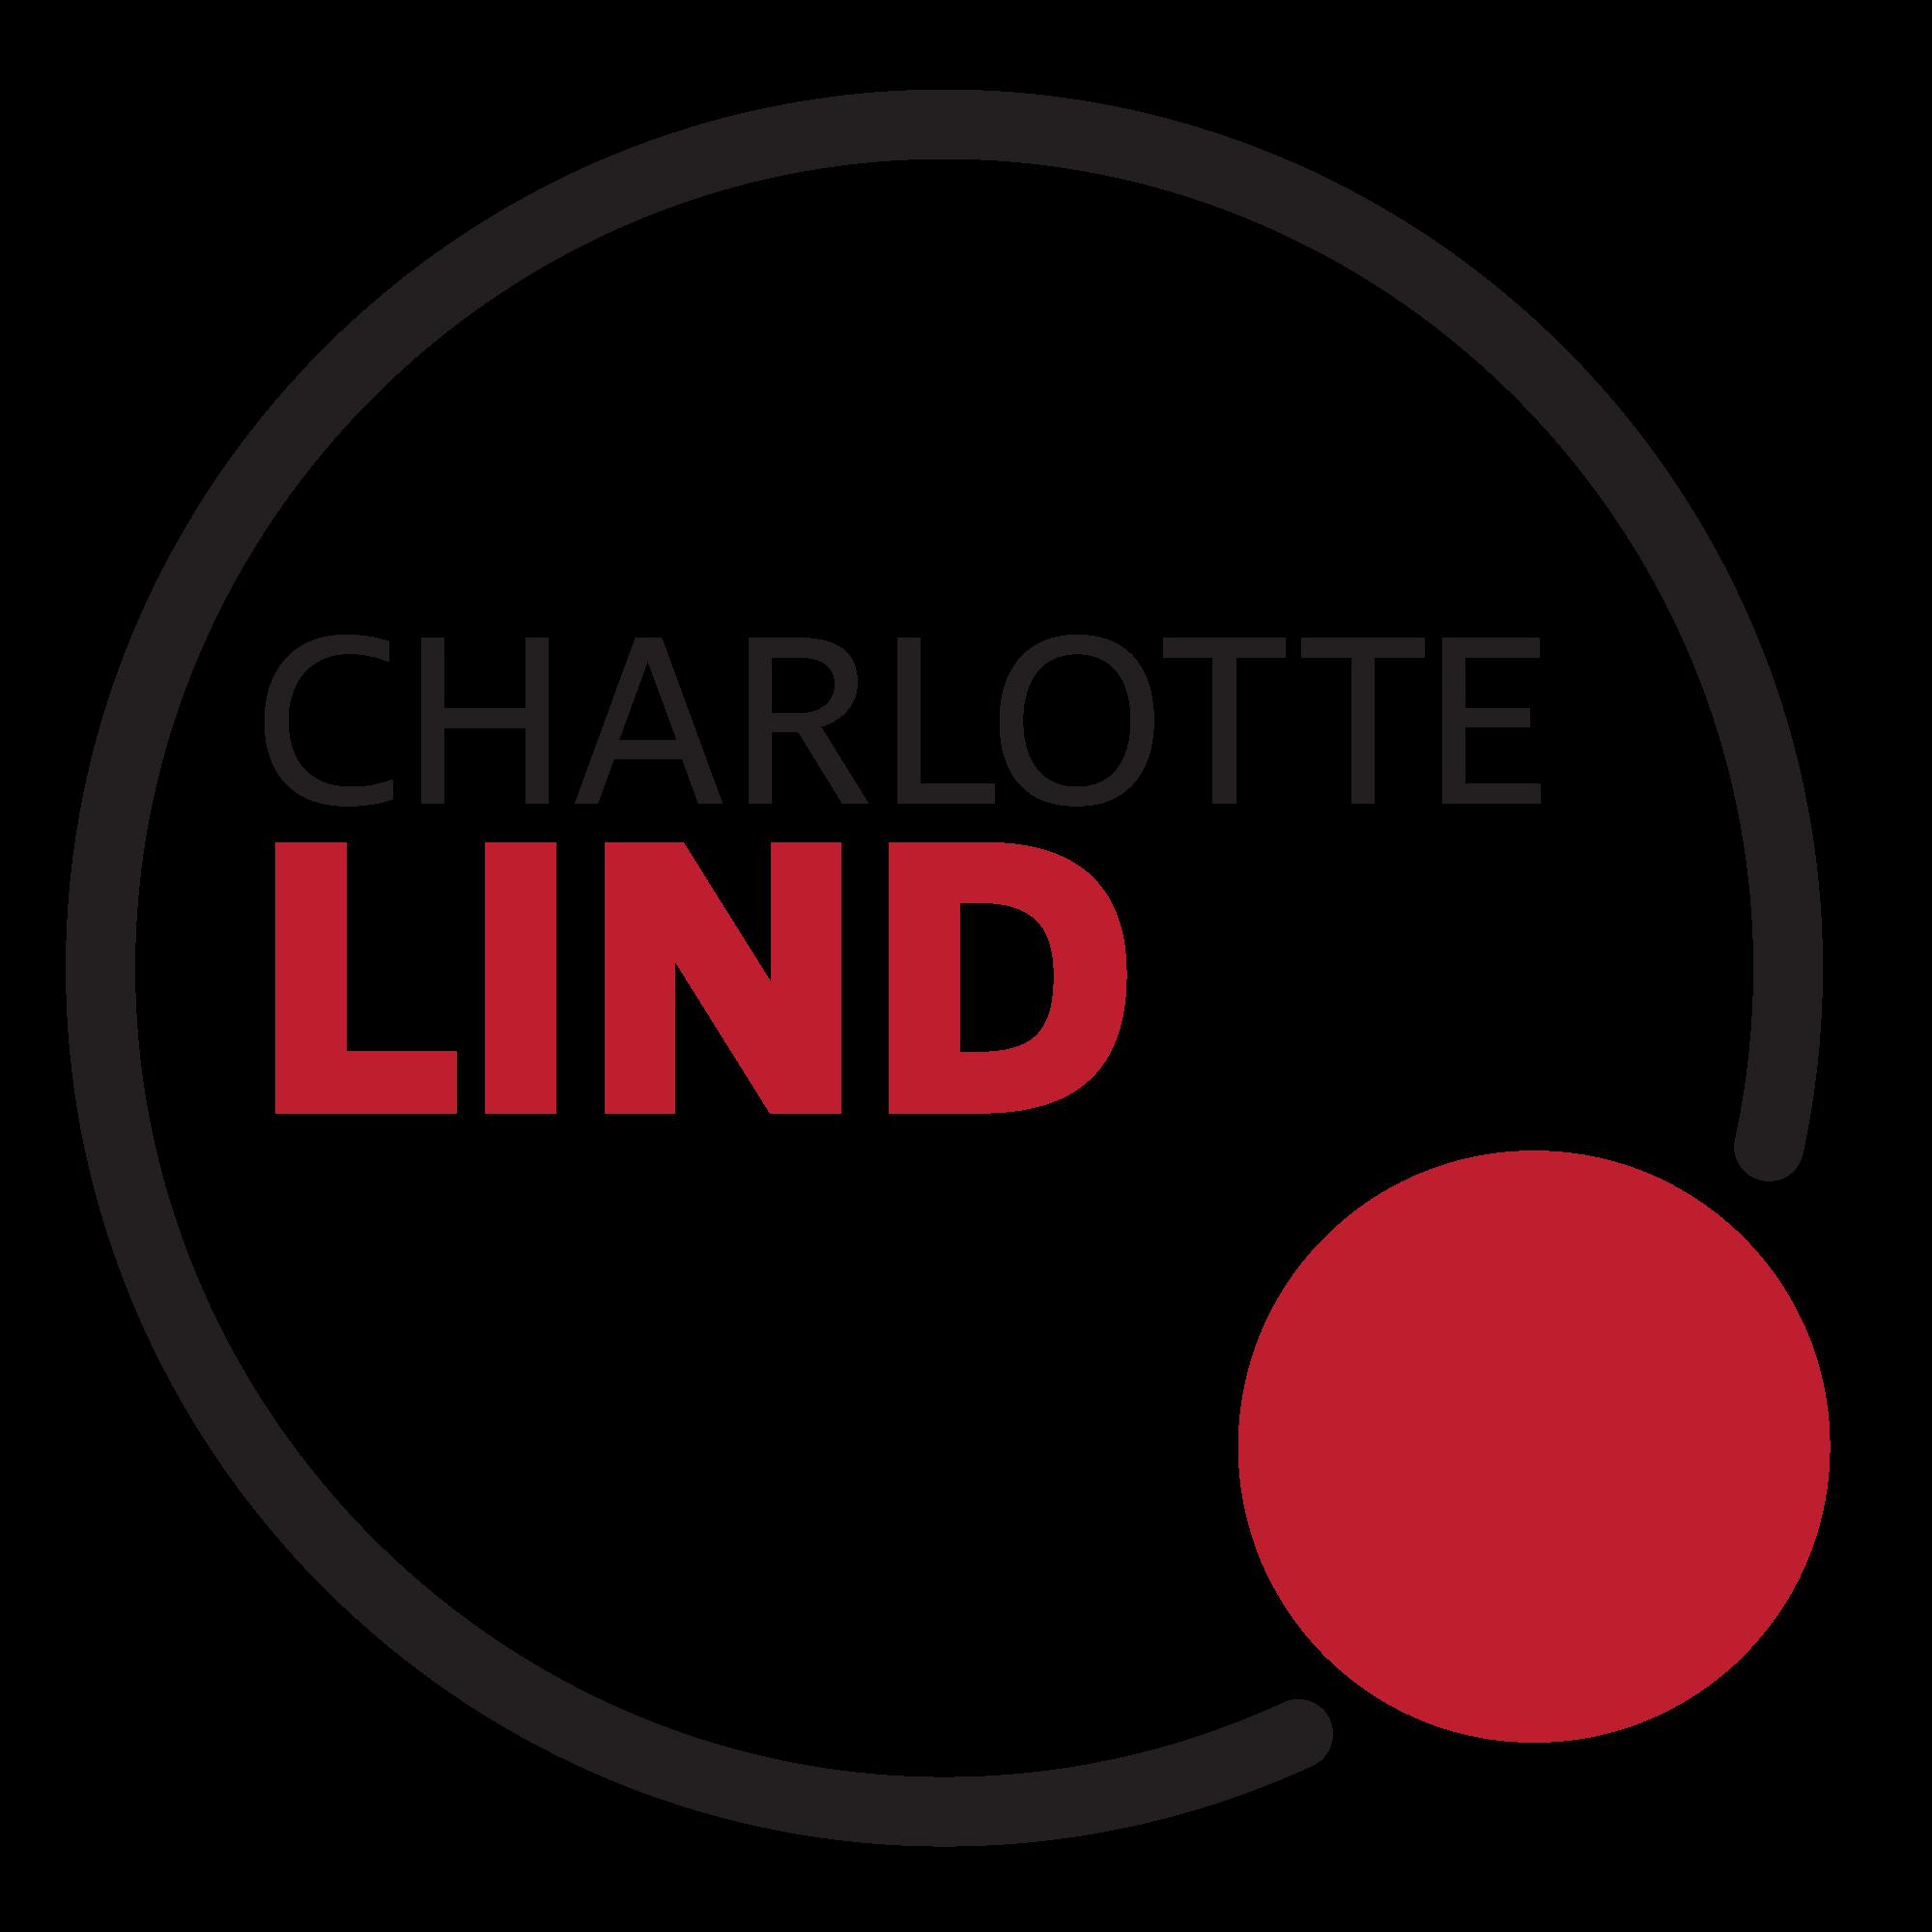 charlottelind.com